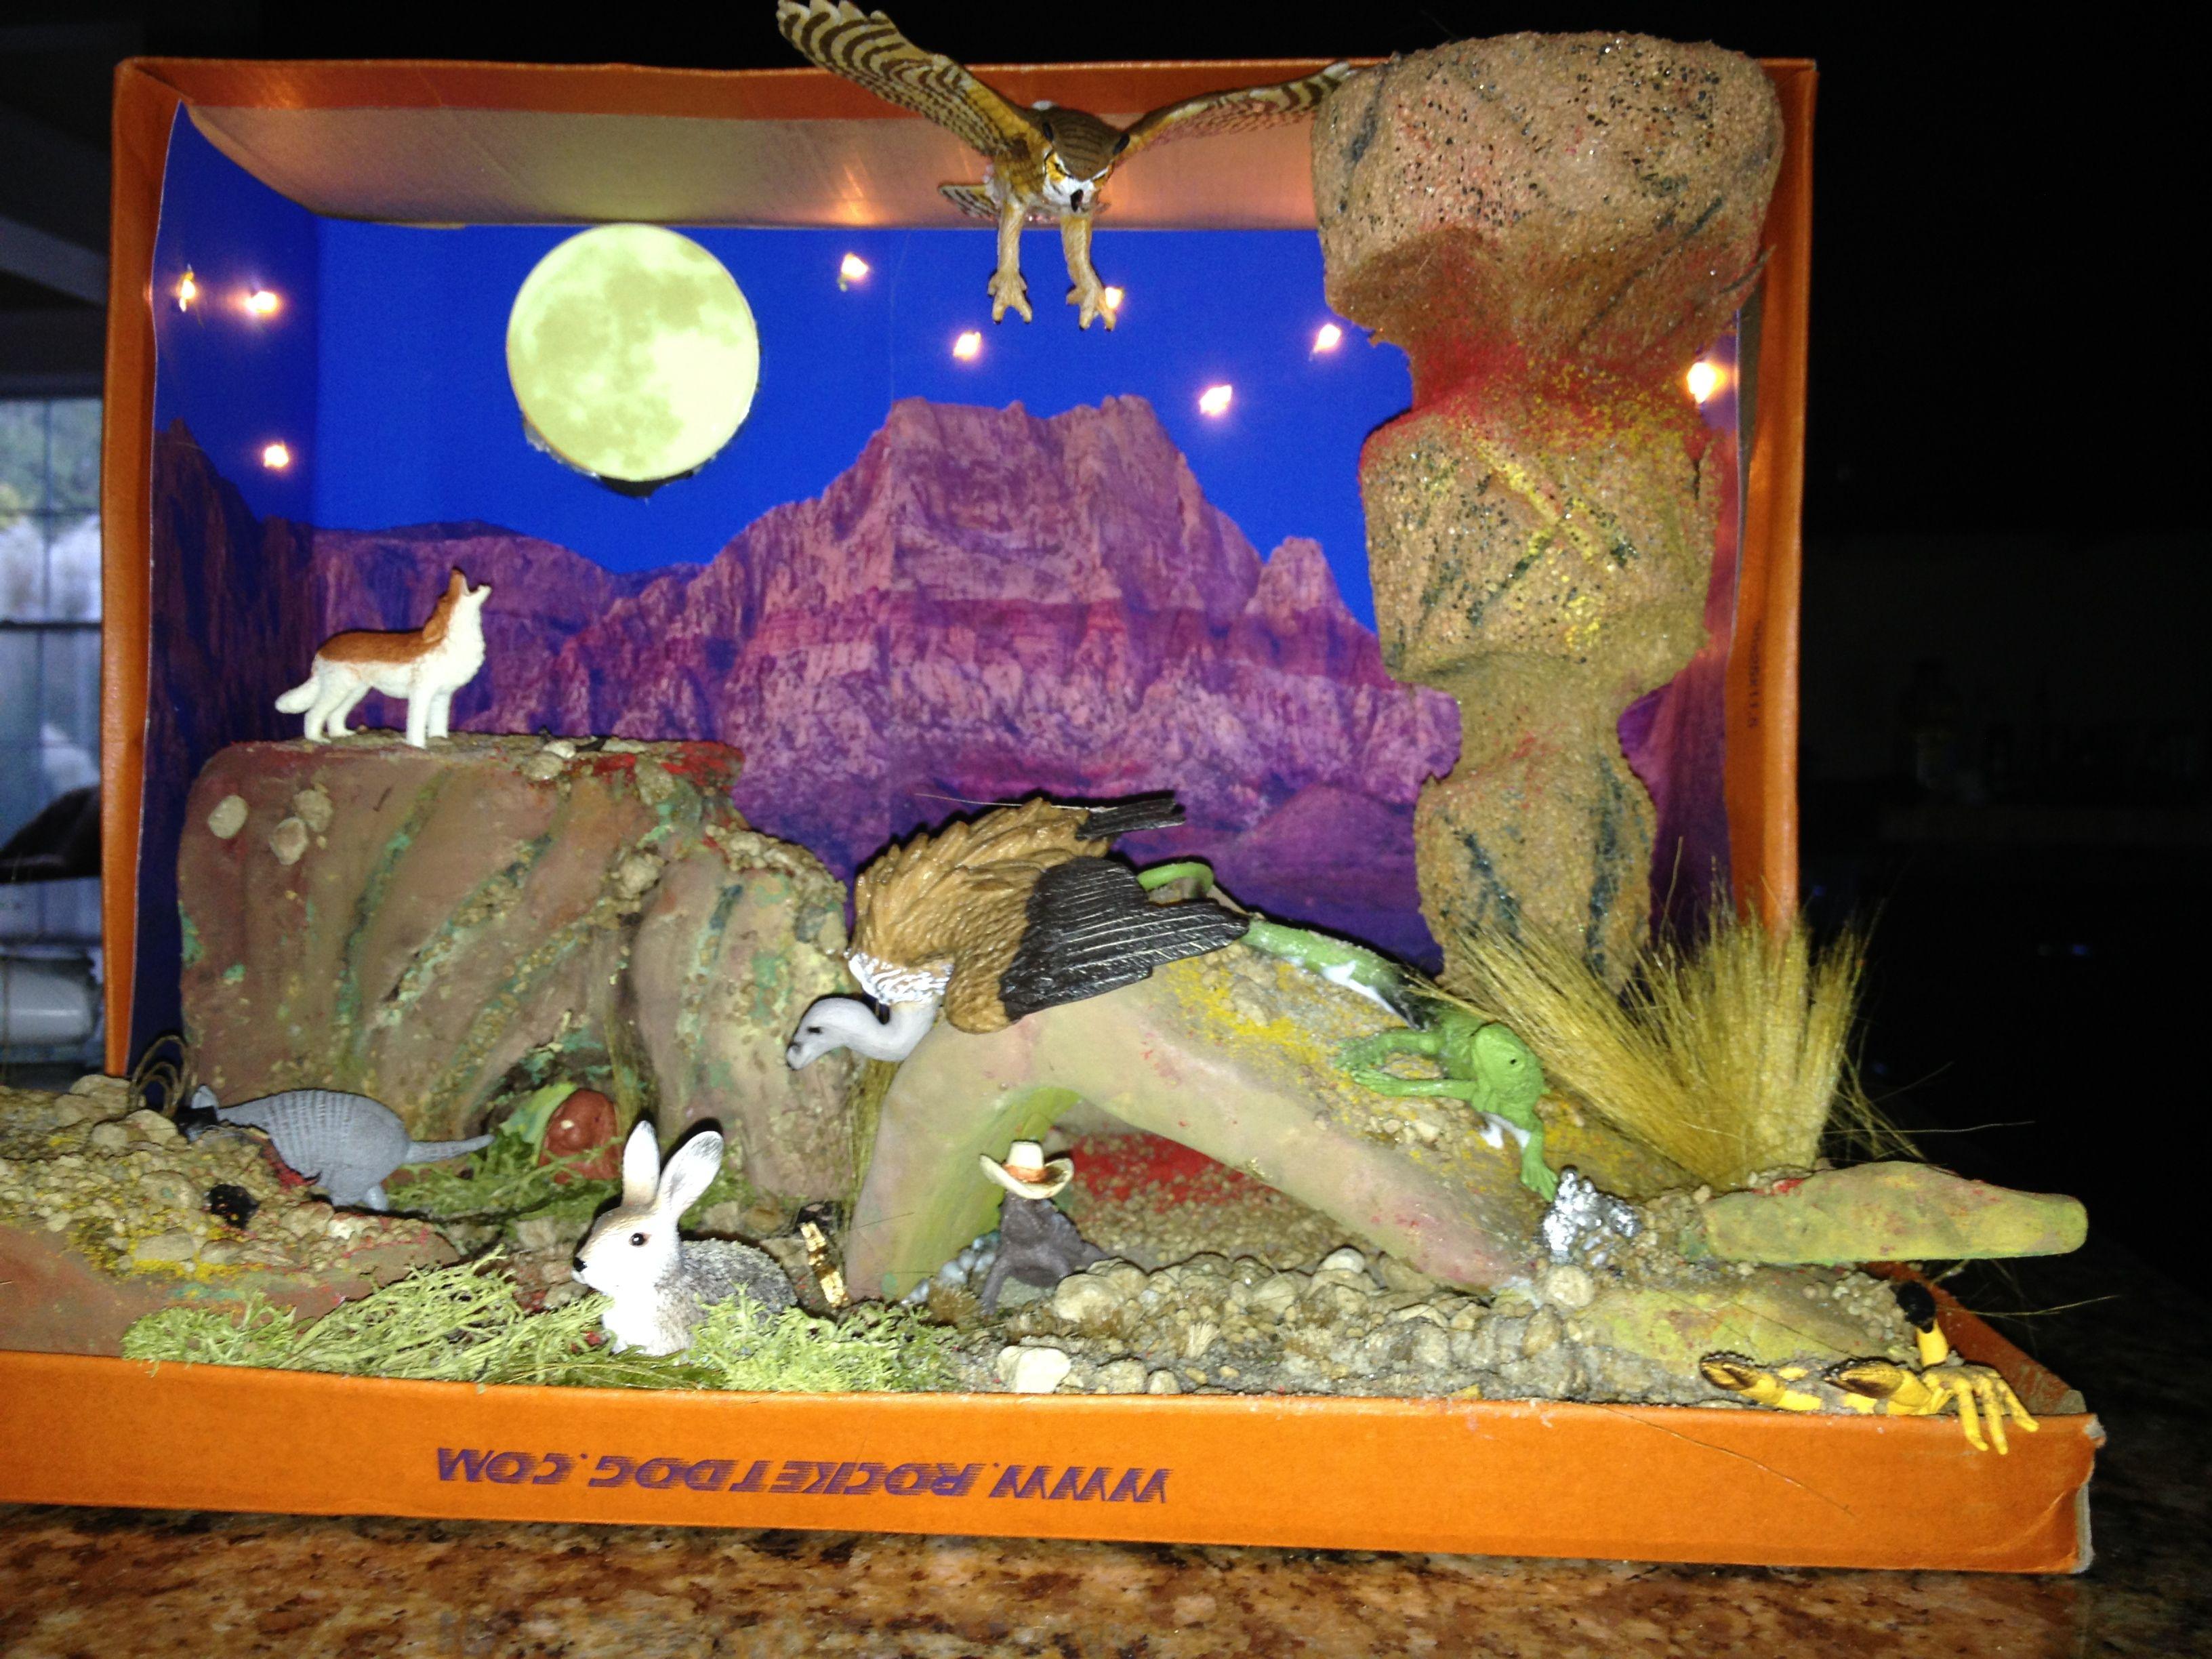 Shoebox Desert Diorama Made For 3rd Grade Project